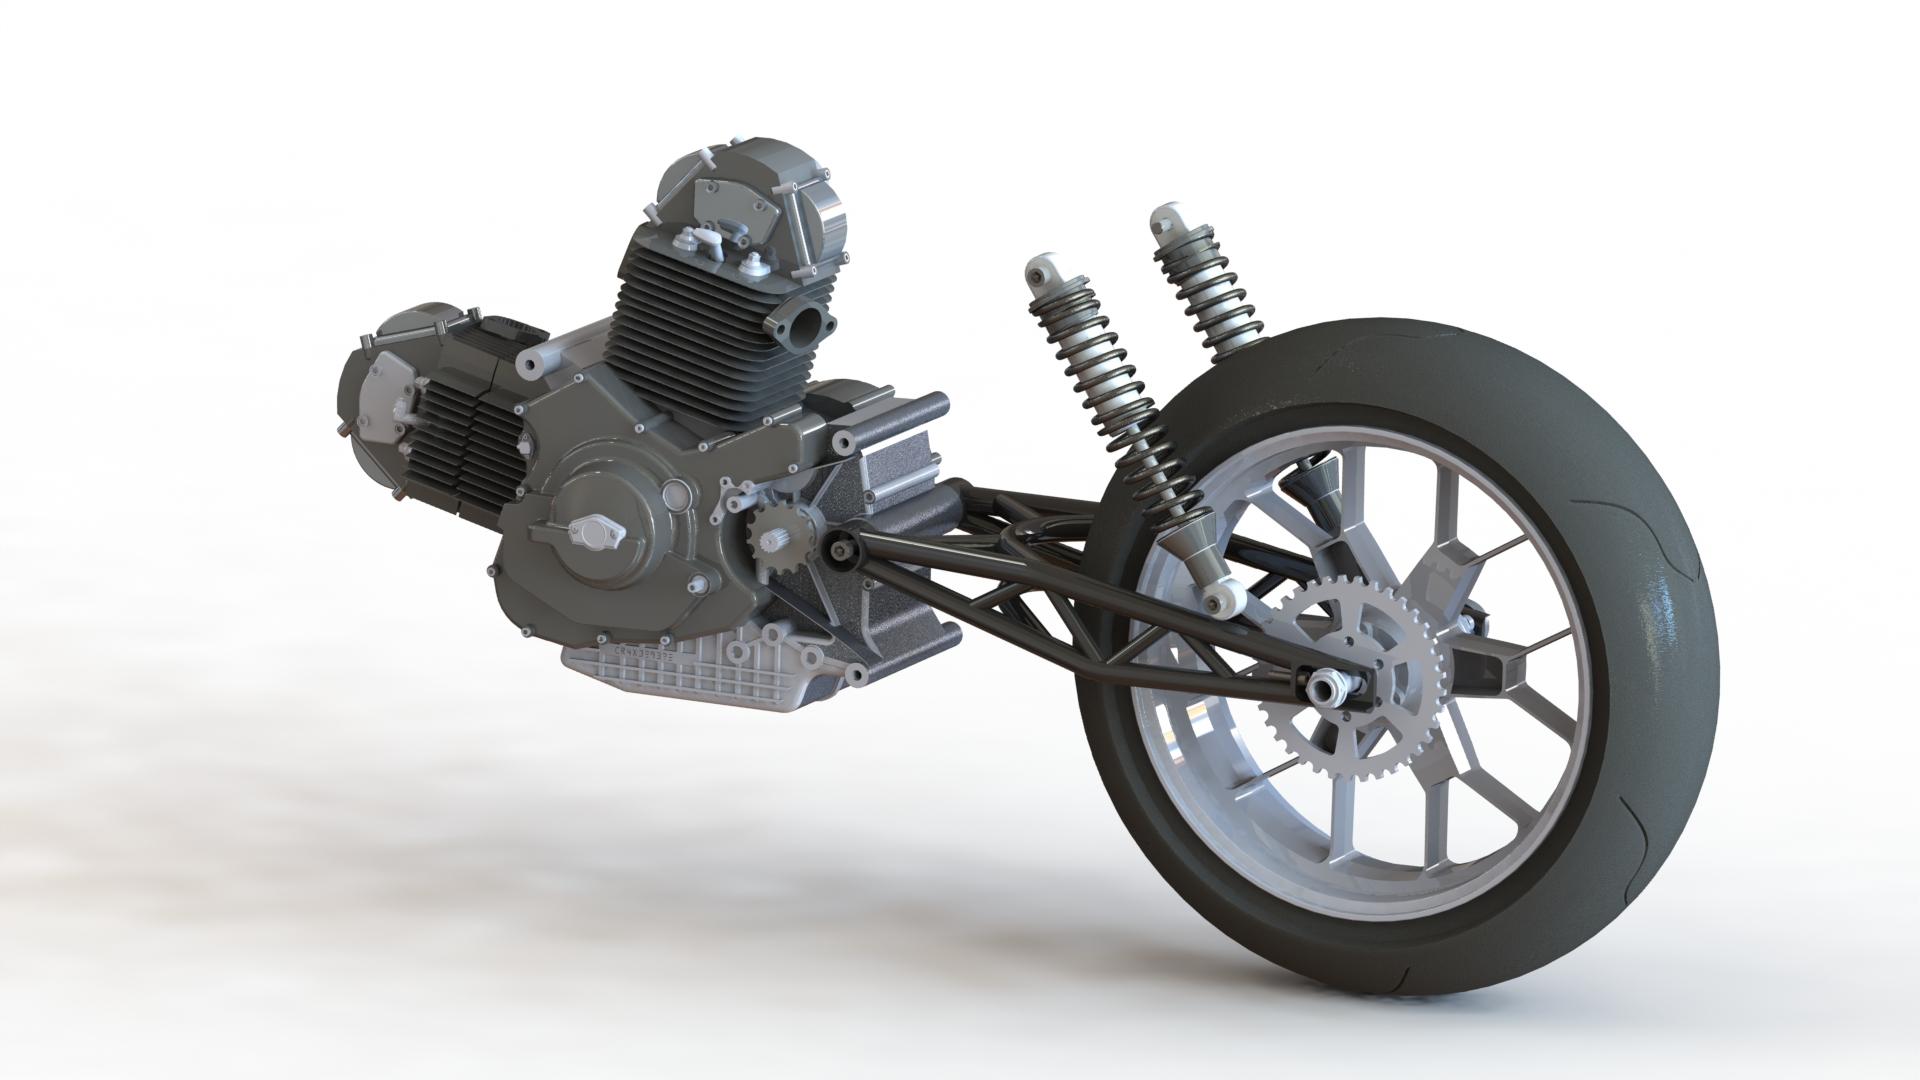 Ducati 900 trellis